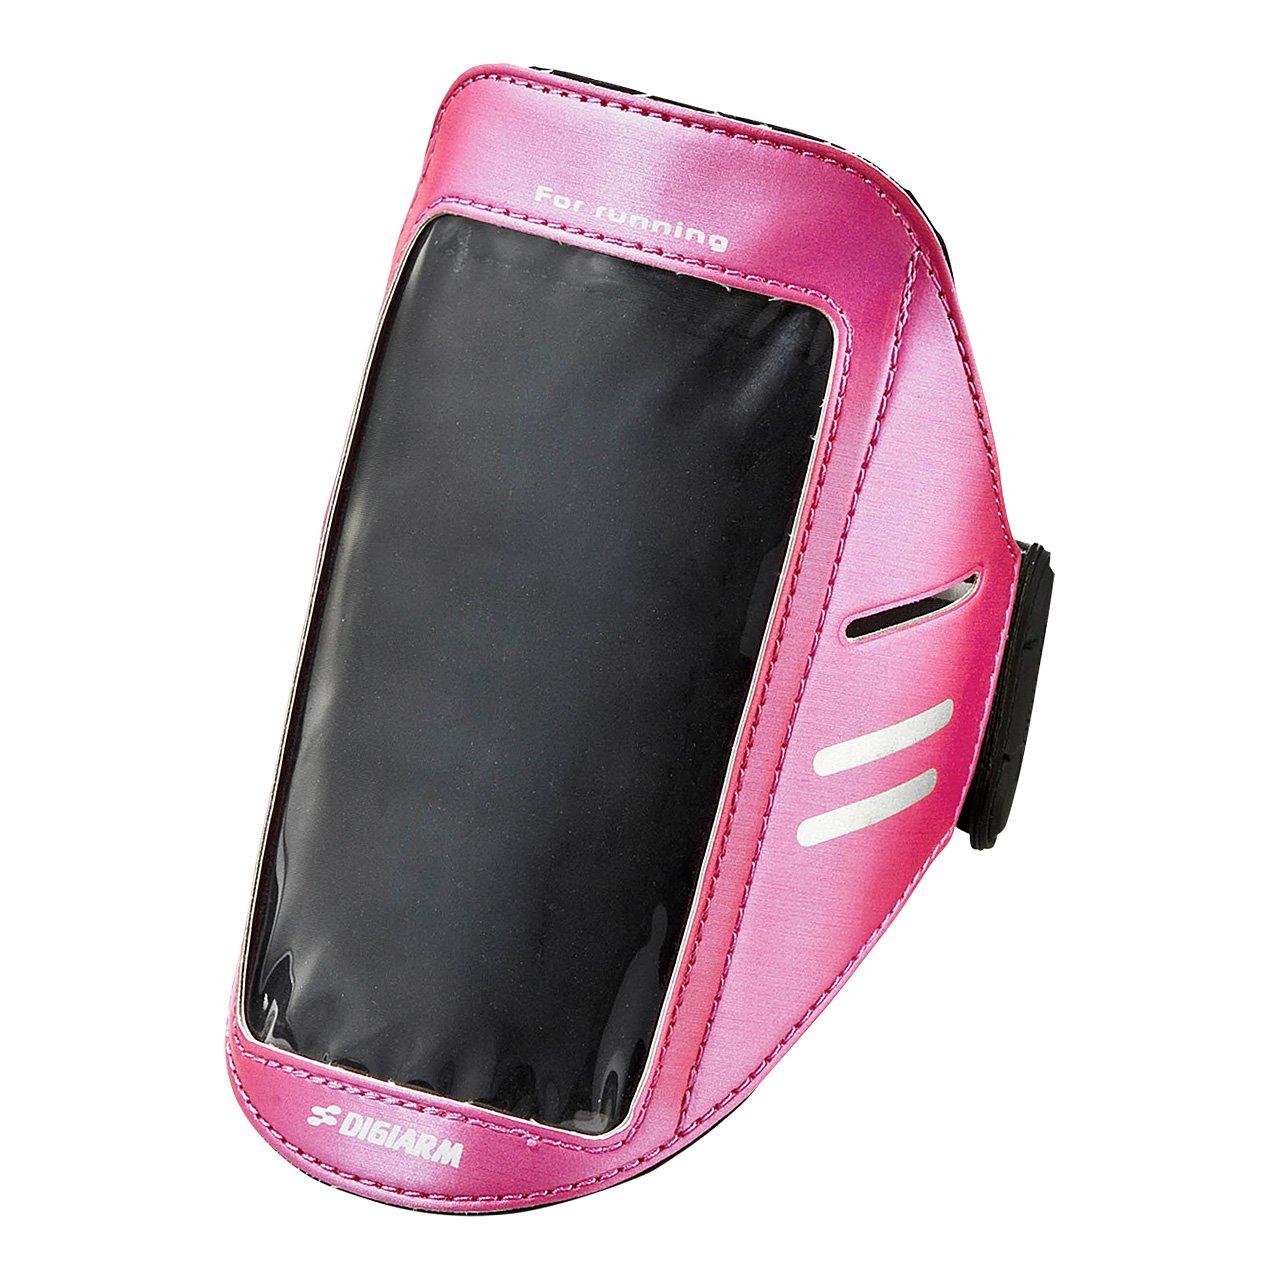 Sanwa armband sport case (L size ) Pink PDA-MP3C11P